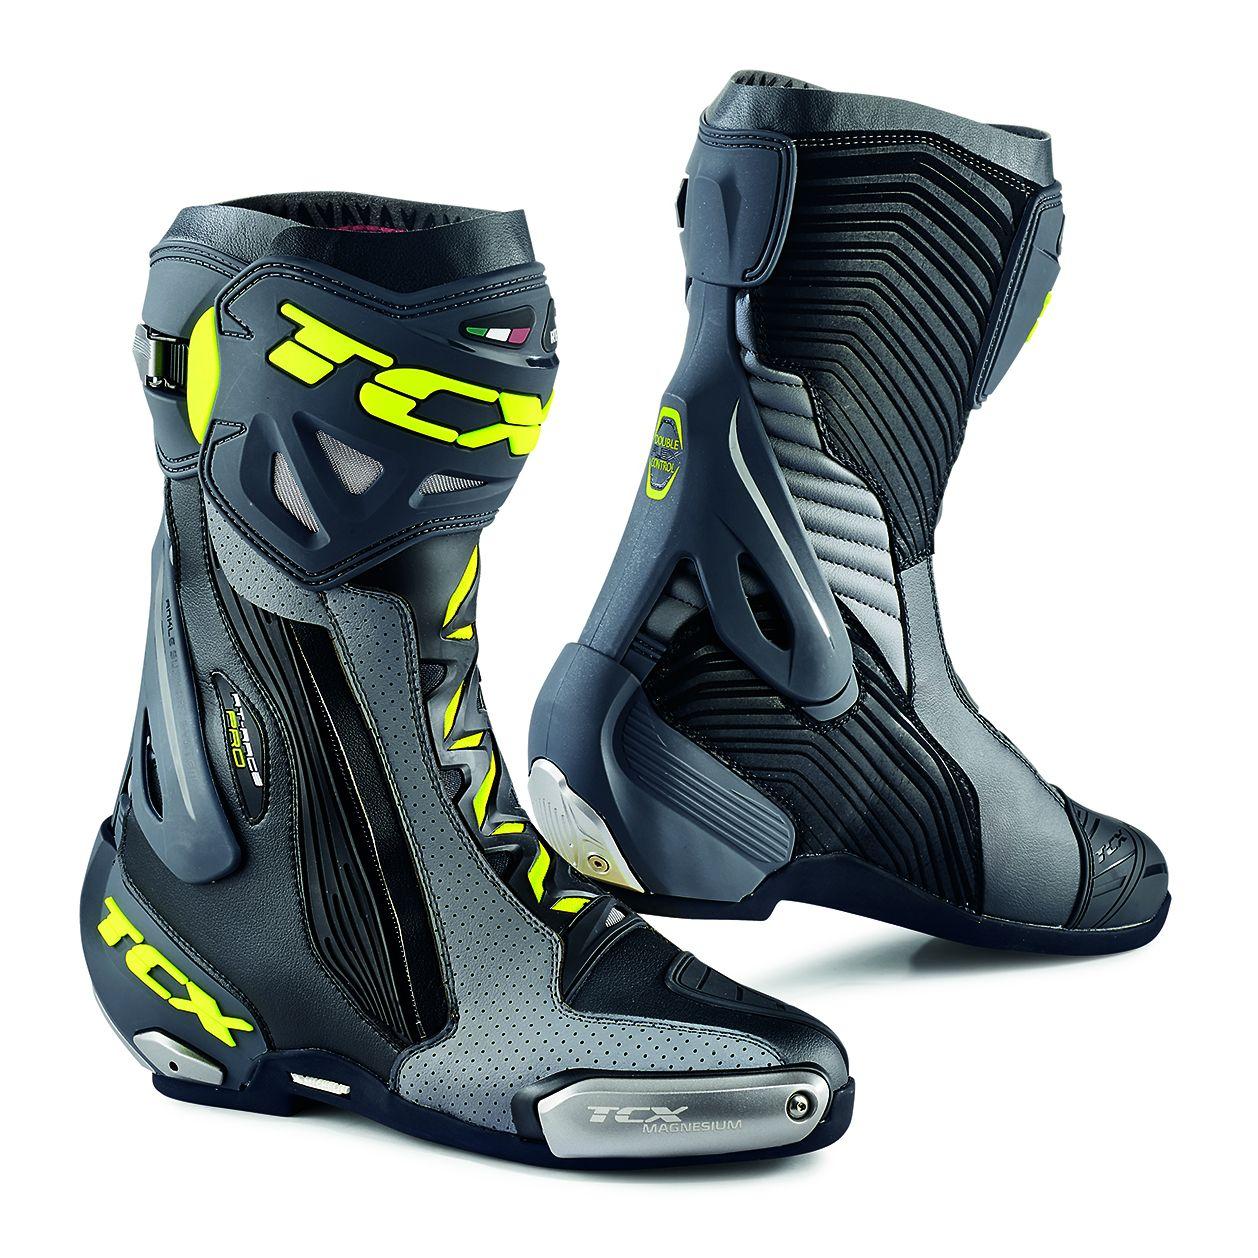 Bottes TCX Boots RT RACE PRO AIR